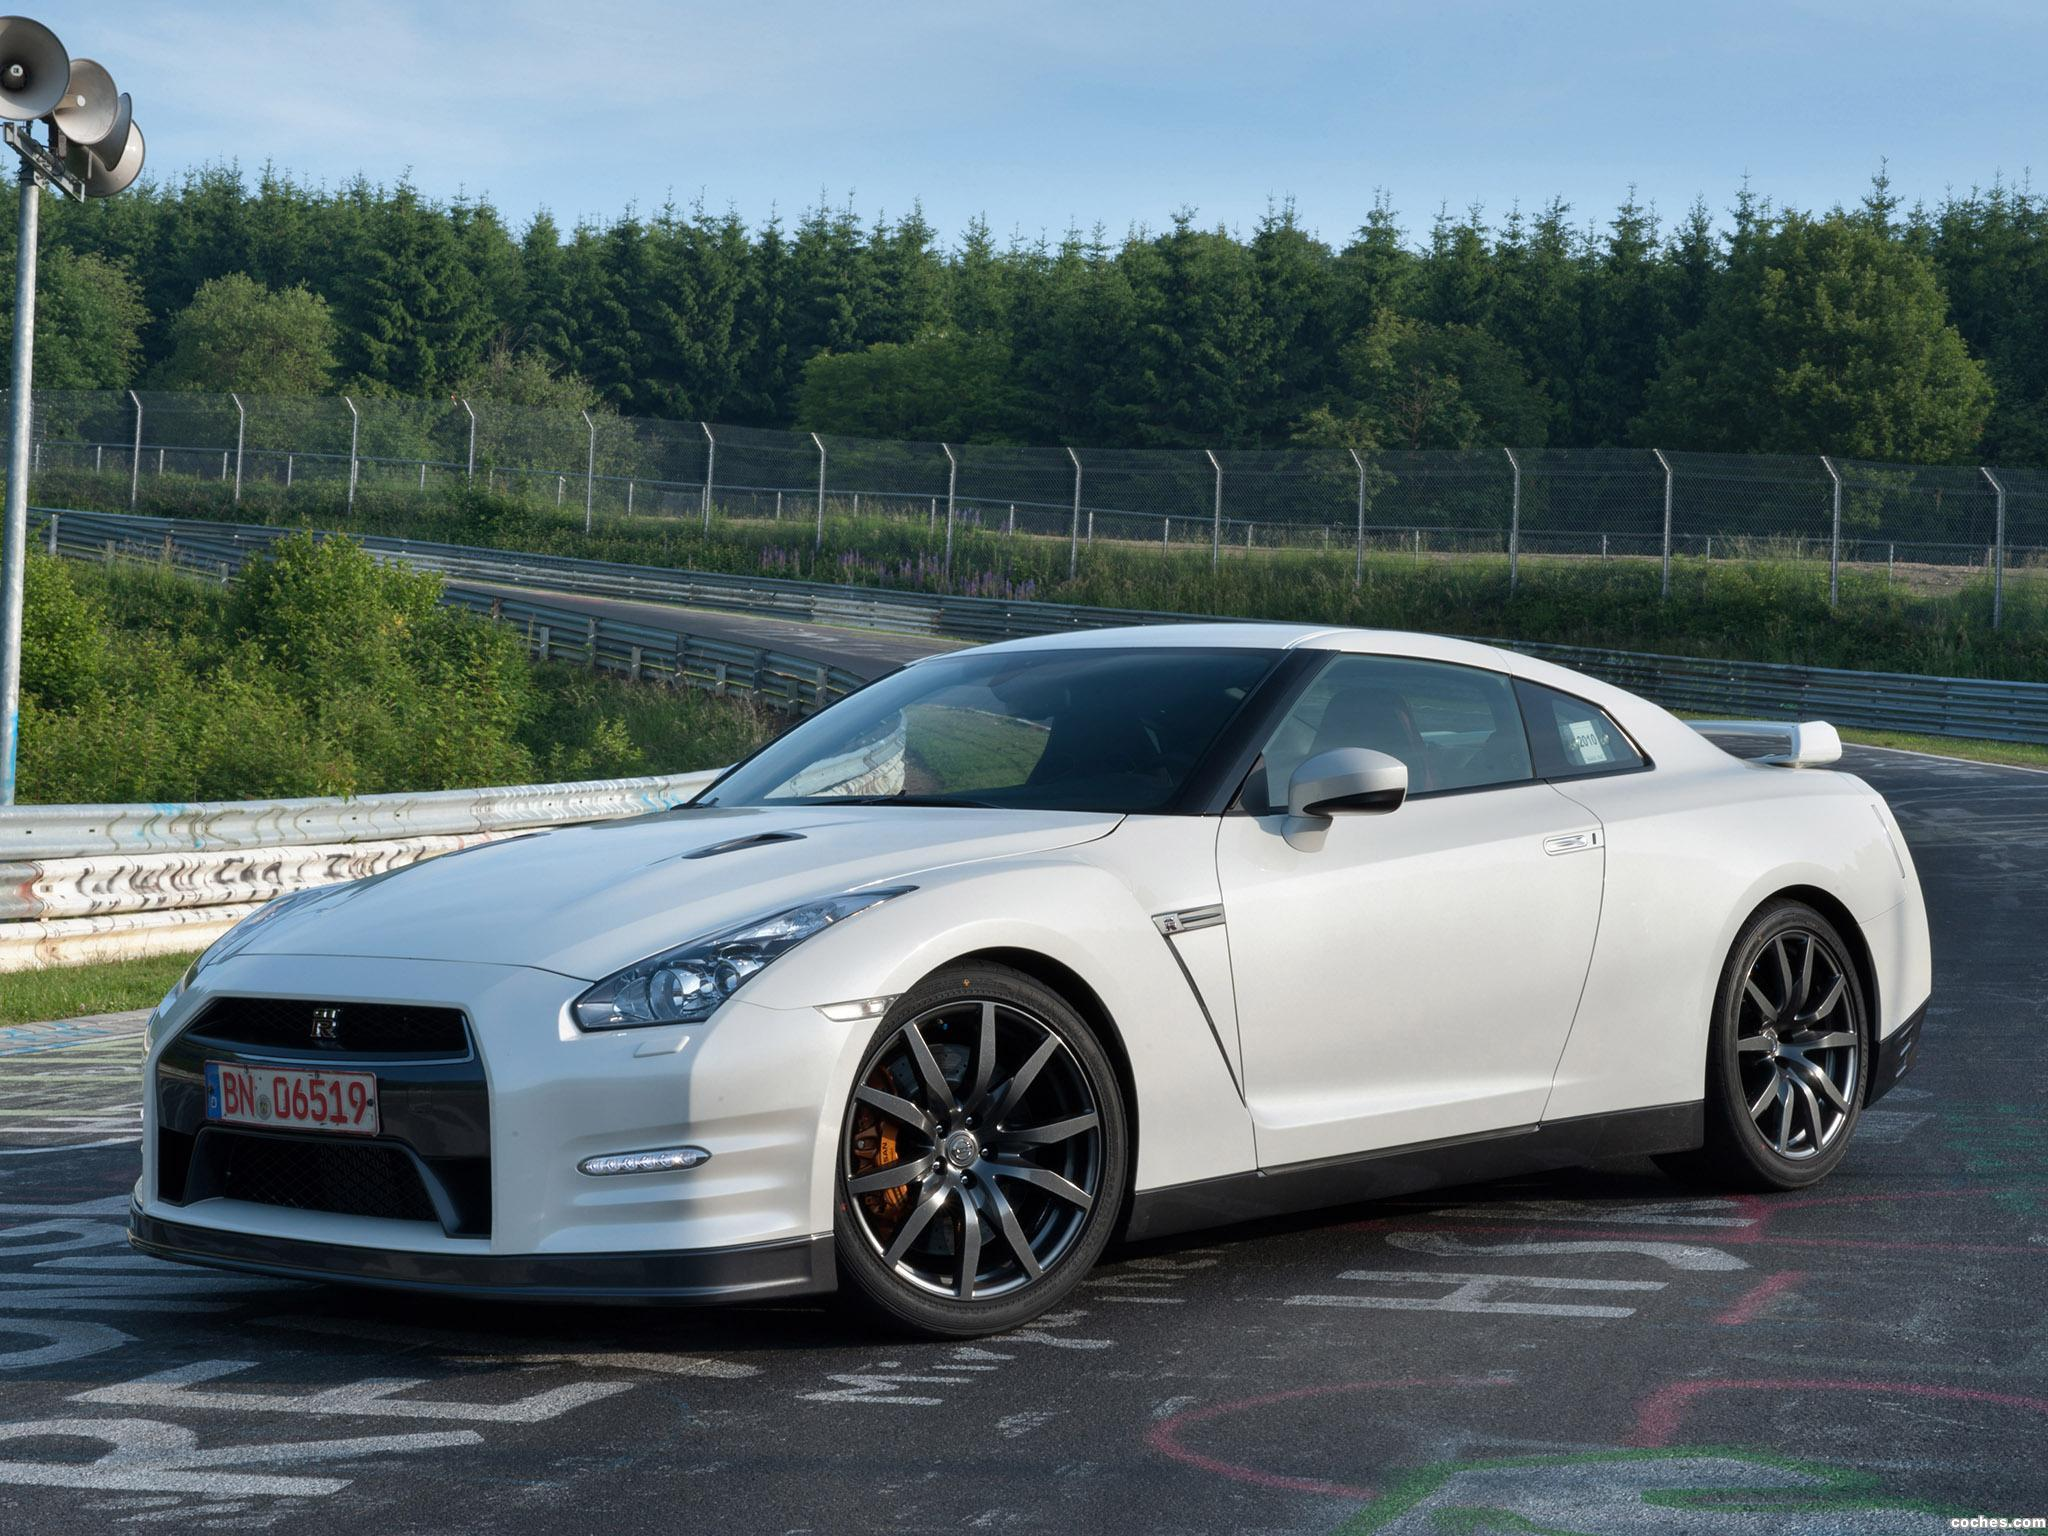 Foto 0 de Nissan GT-R 2010